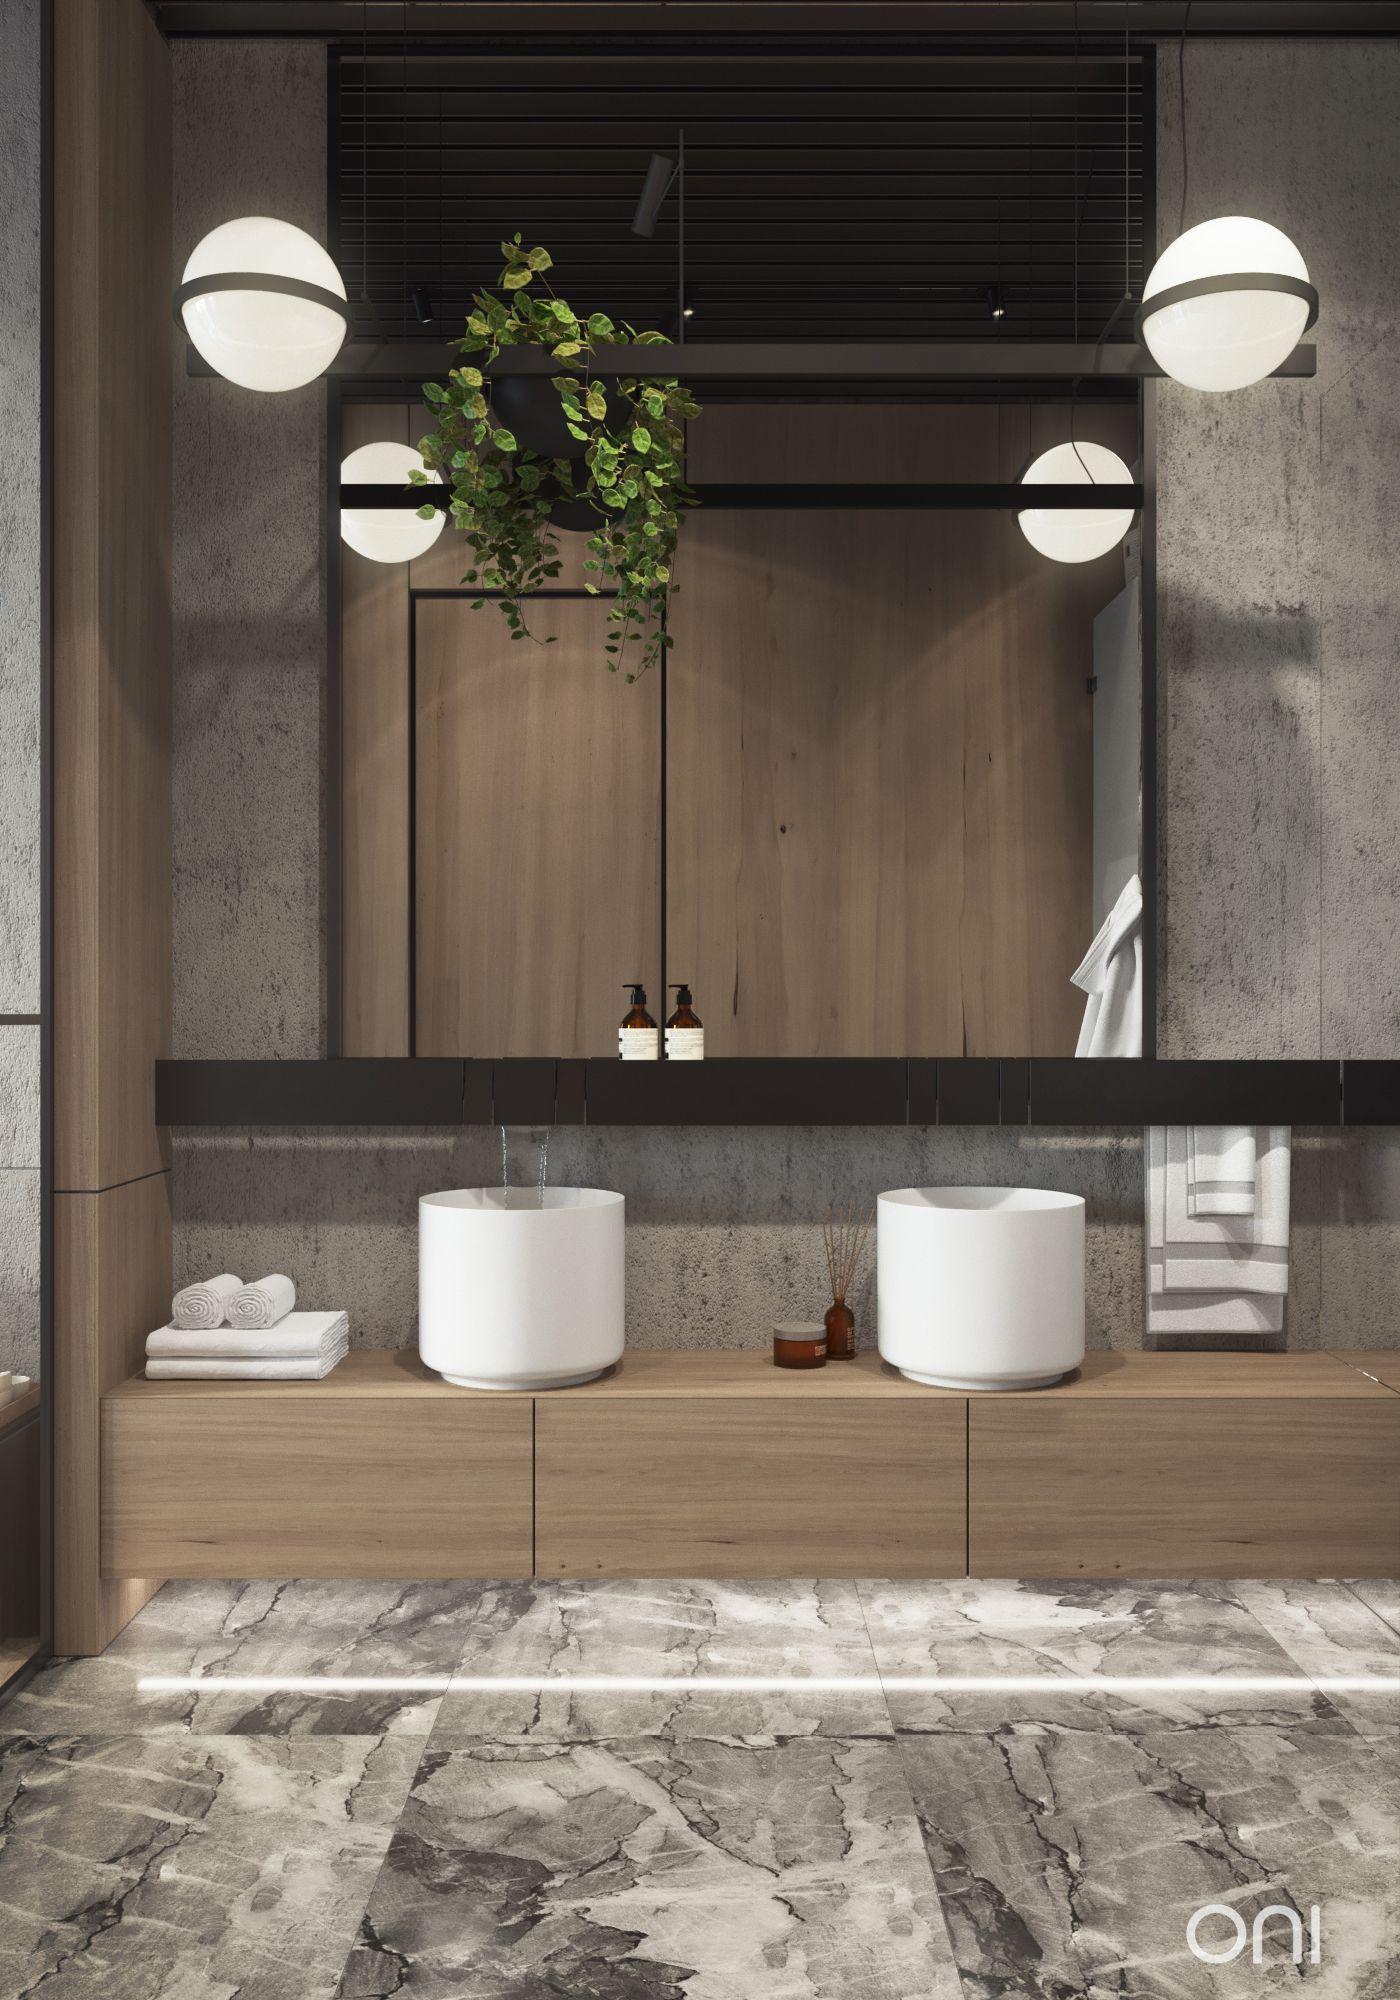 10 Gorgeous And Modern Powder Room Design Ideas Small Elegant Tiny Farmhouse Onbudget Industrial Style Bathroom Bathroom Styling Industrial Bathroom Decor